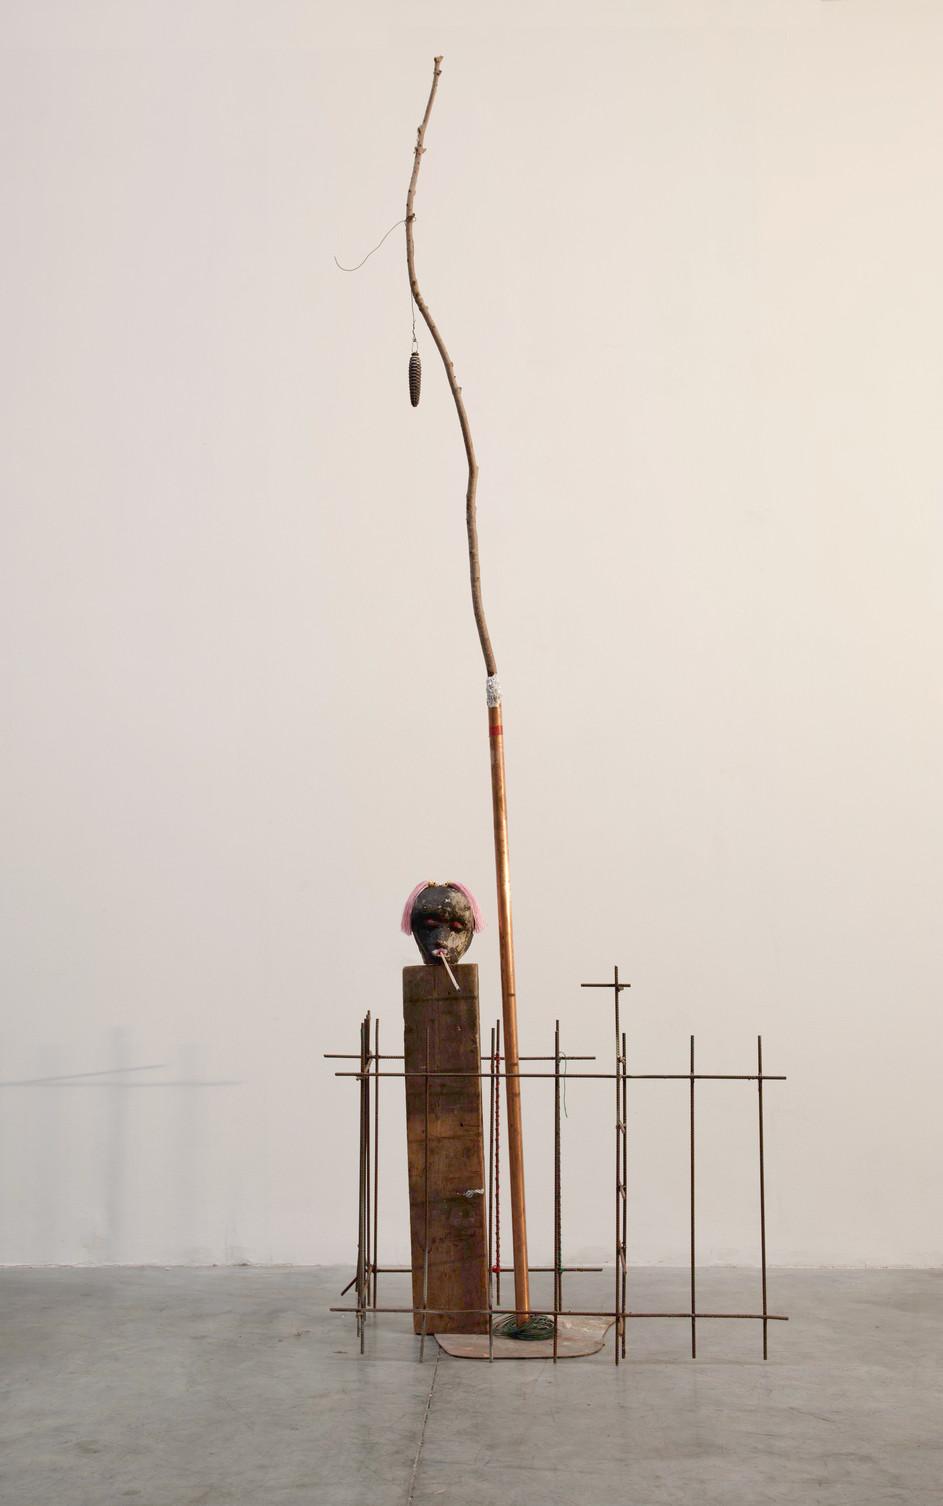 HENK VISCH Monument to Commemorate Sympathy, 2021 metal, wood, styrodor 255 x 85 x 61 cm